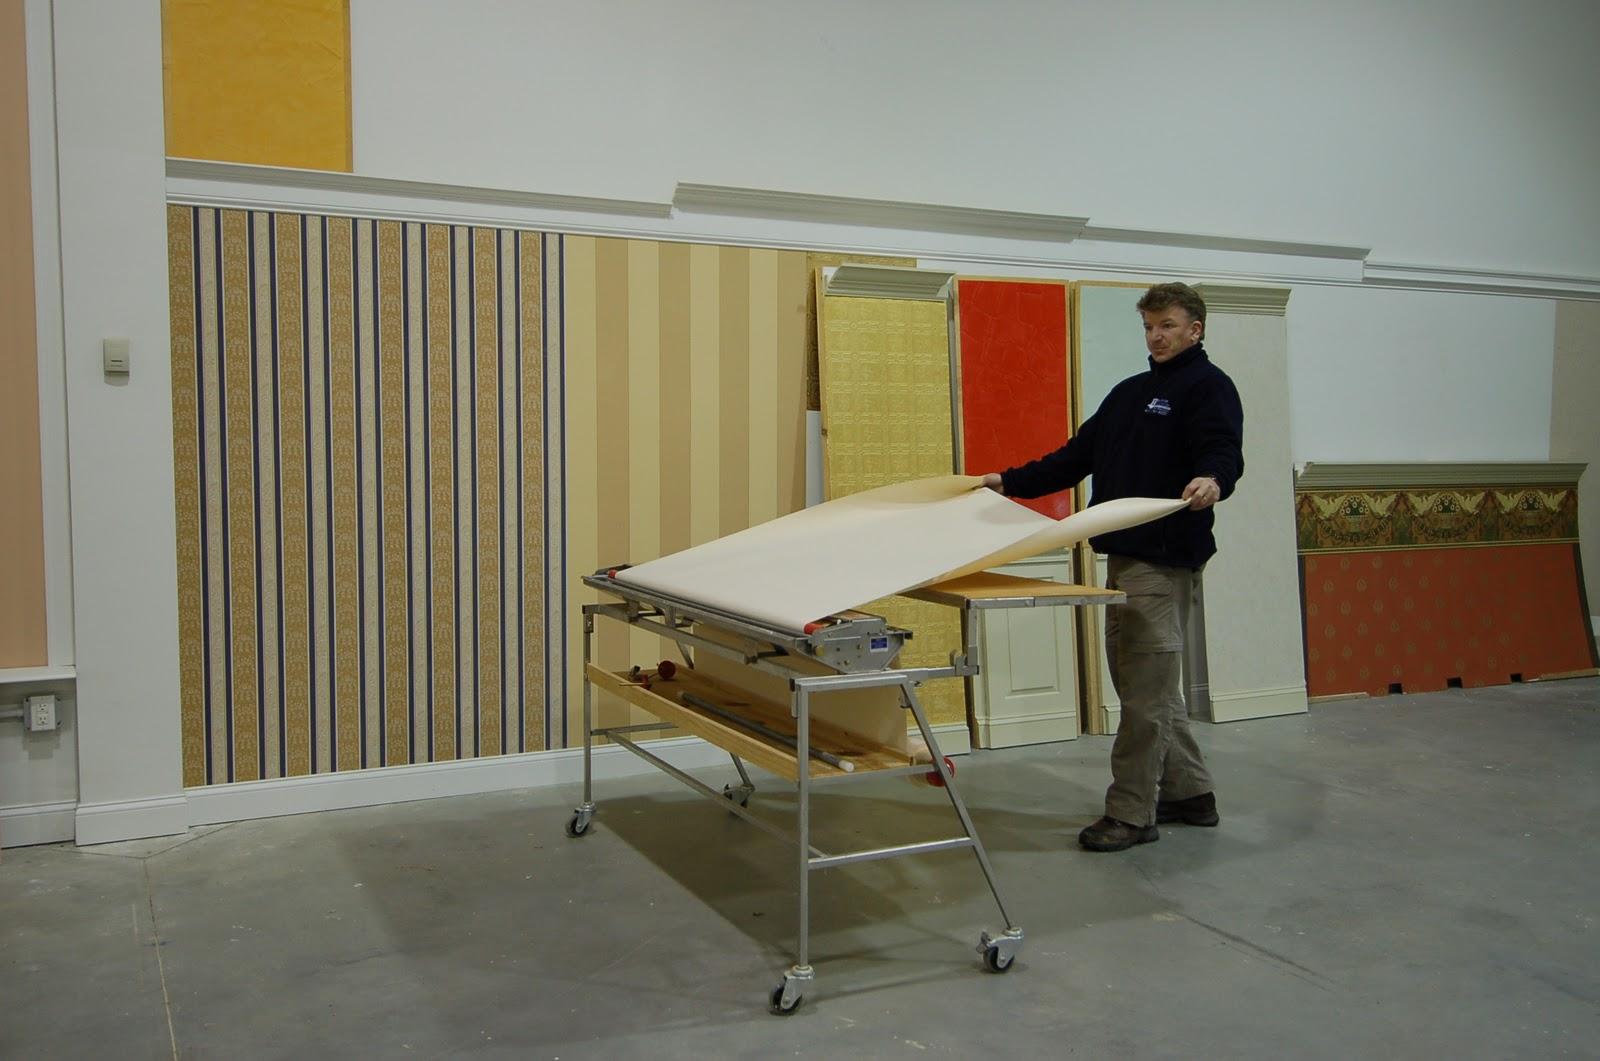 Wallpaper paste machine rentals - Commercial wallpaper pasting machine ...